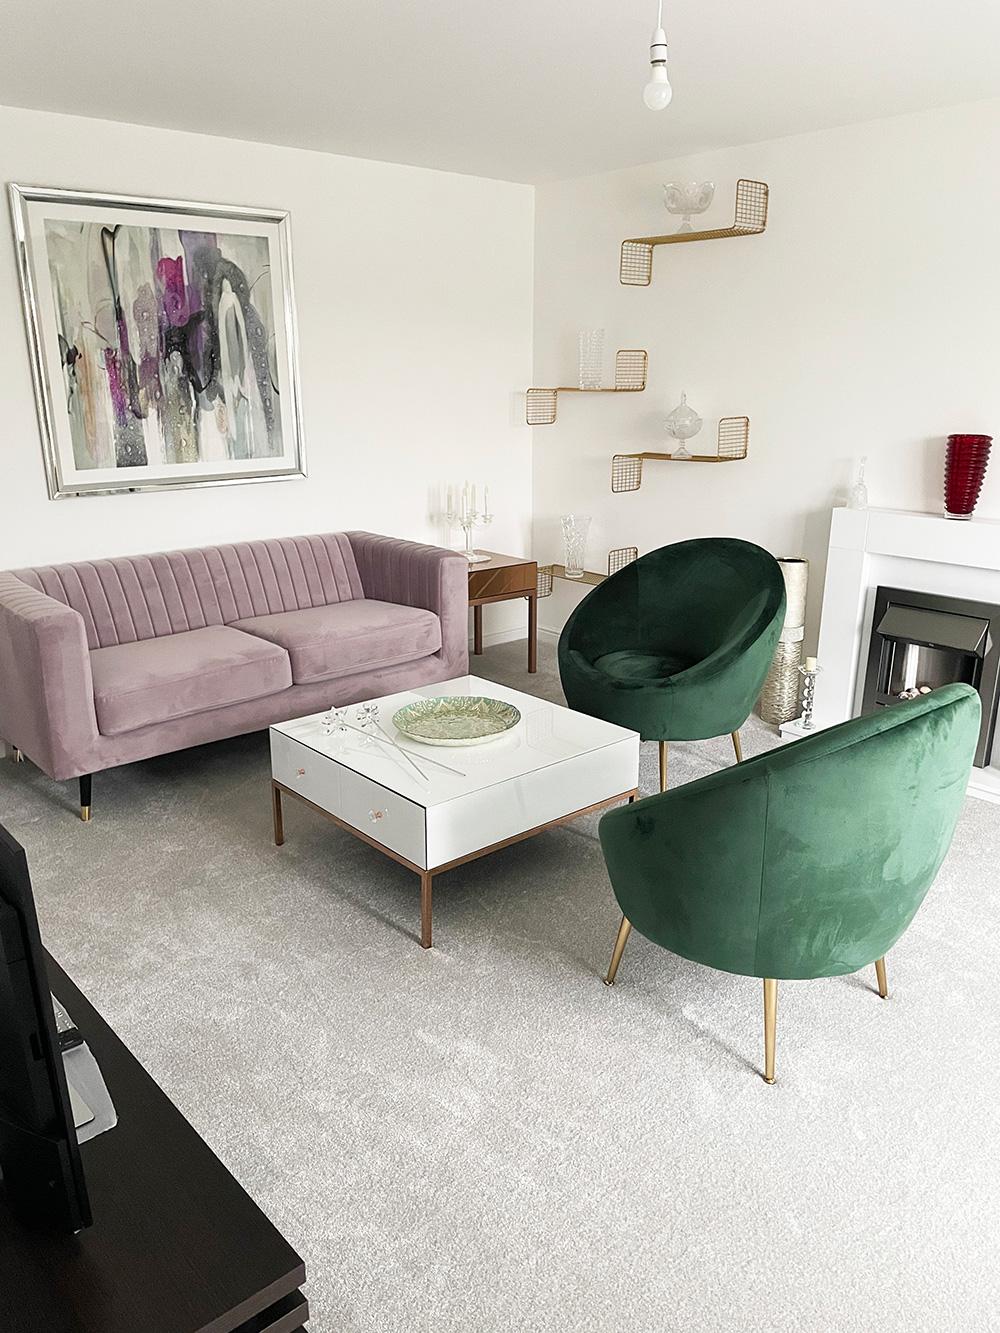 Slender sofa in powder pink in modern living room